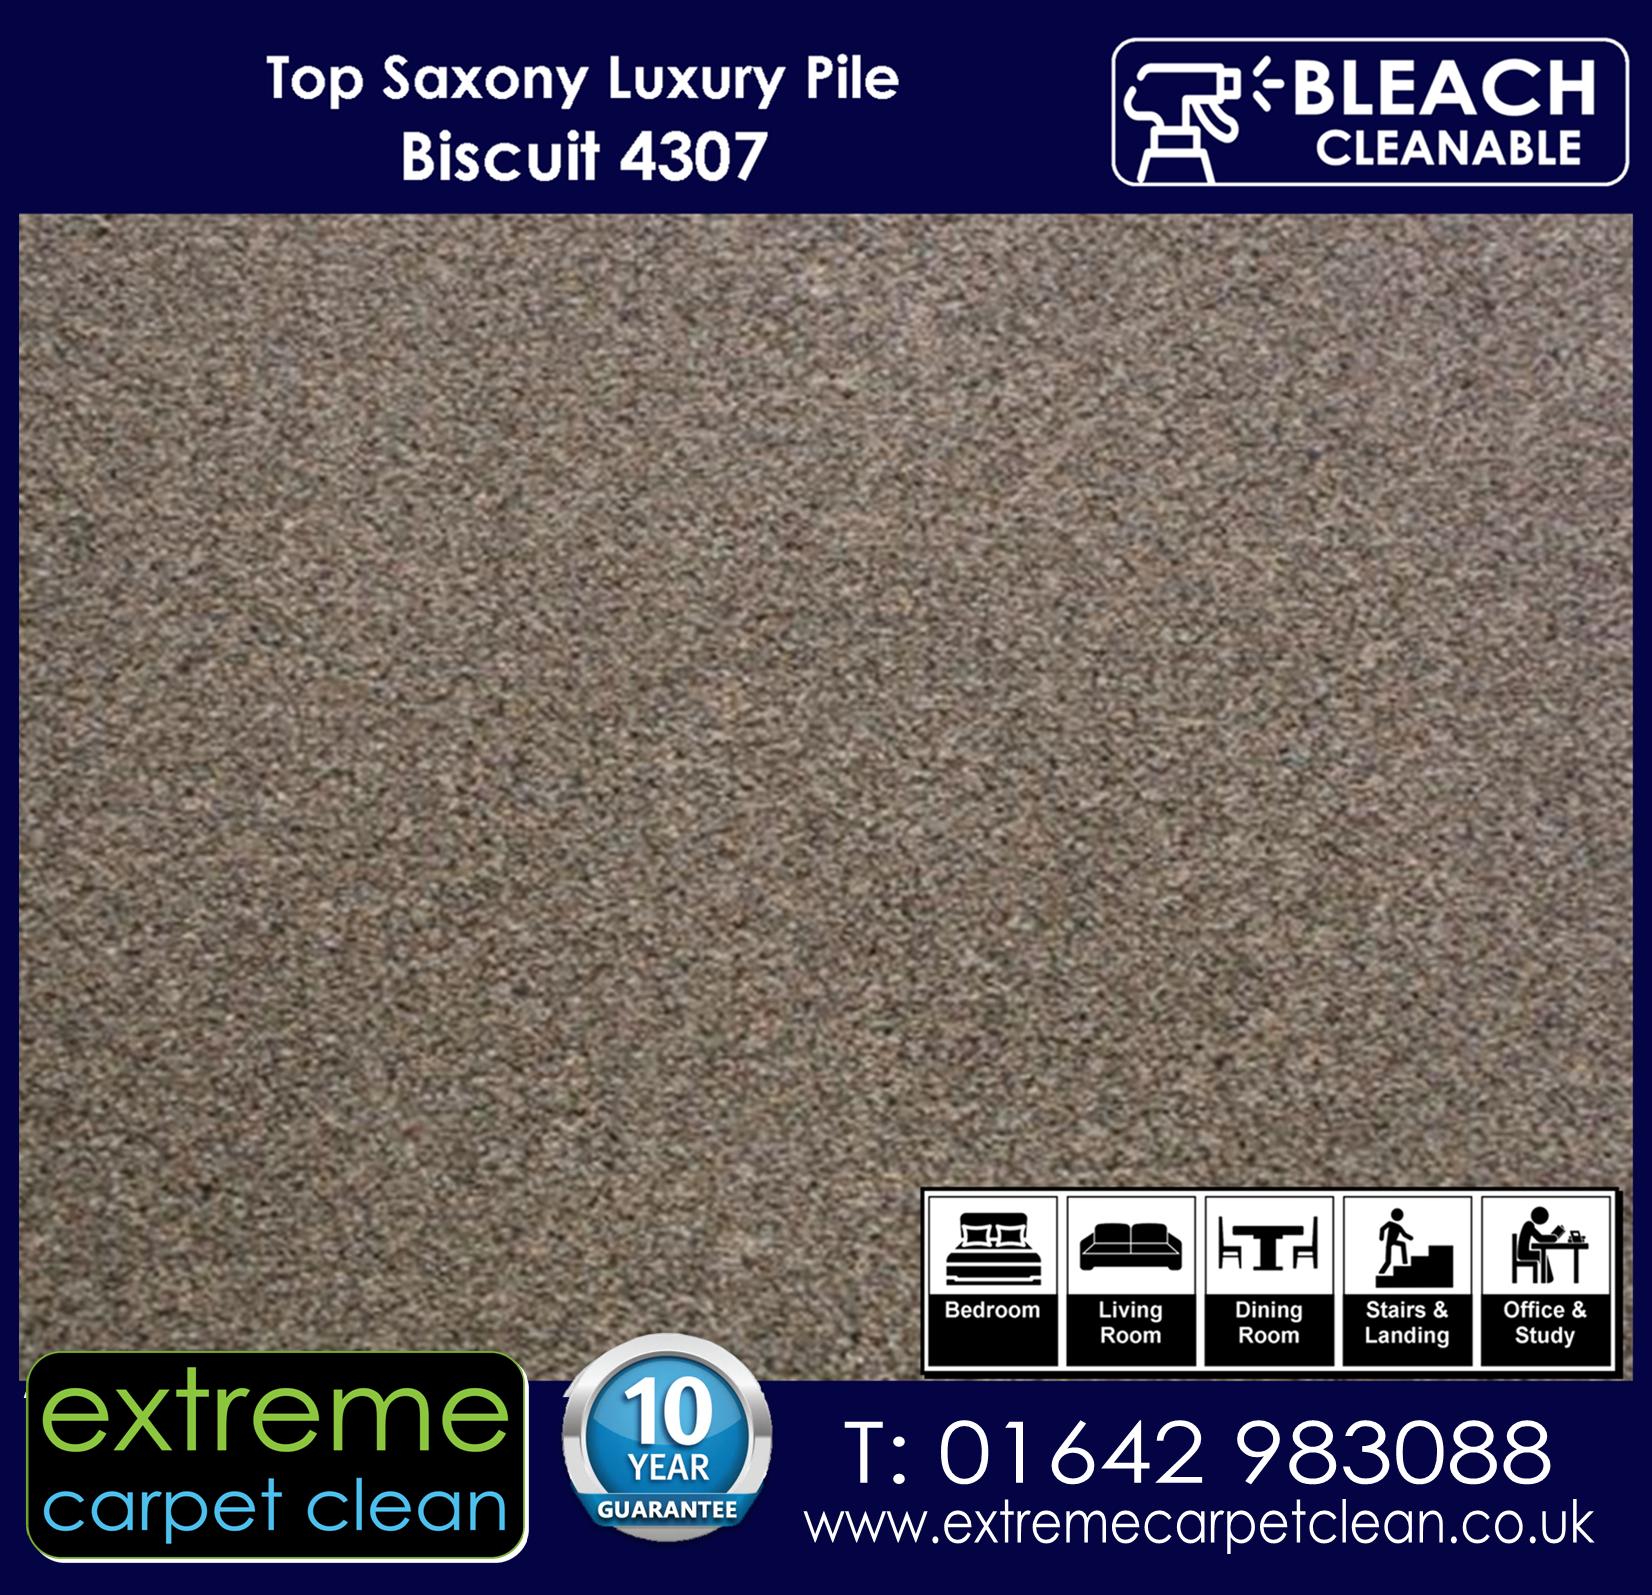 Extreme Carpet Clean Top Saxony Biscuit  Carpet 4307